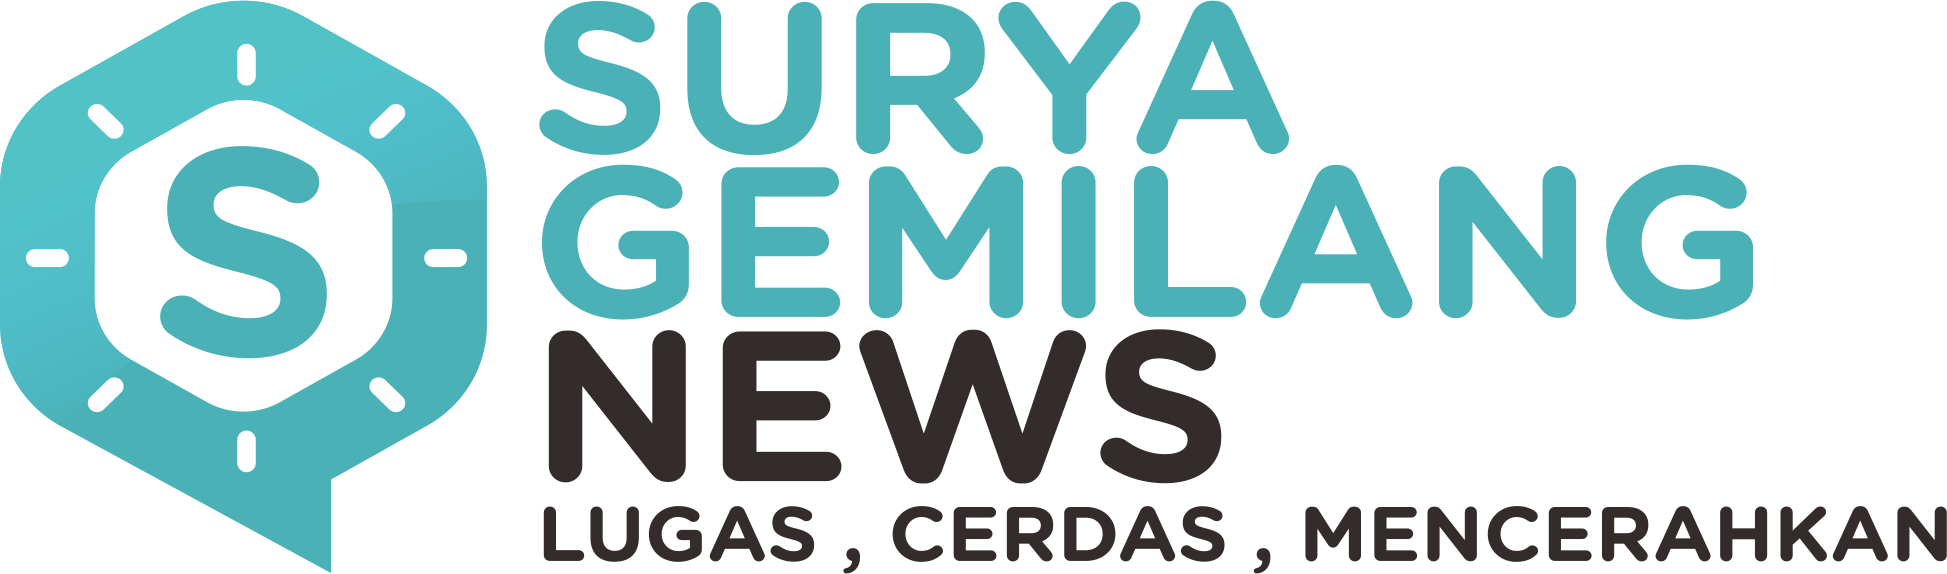 Surya Gemilang News